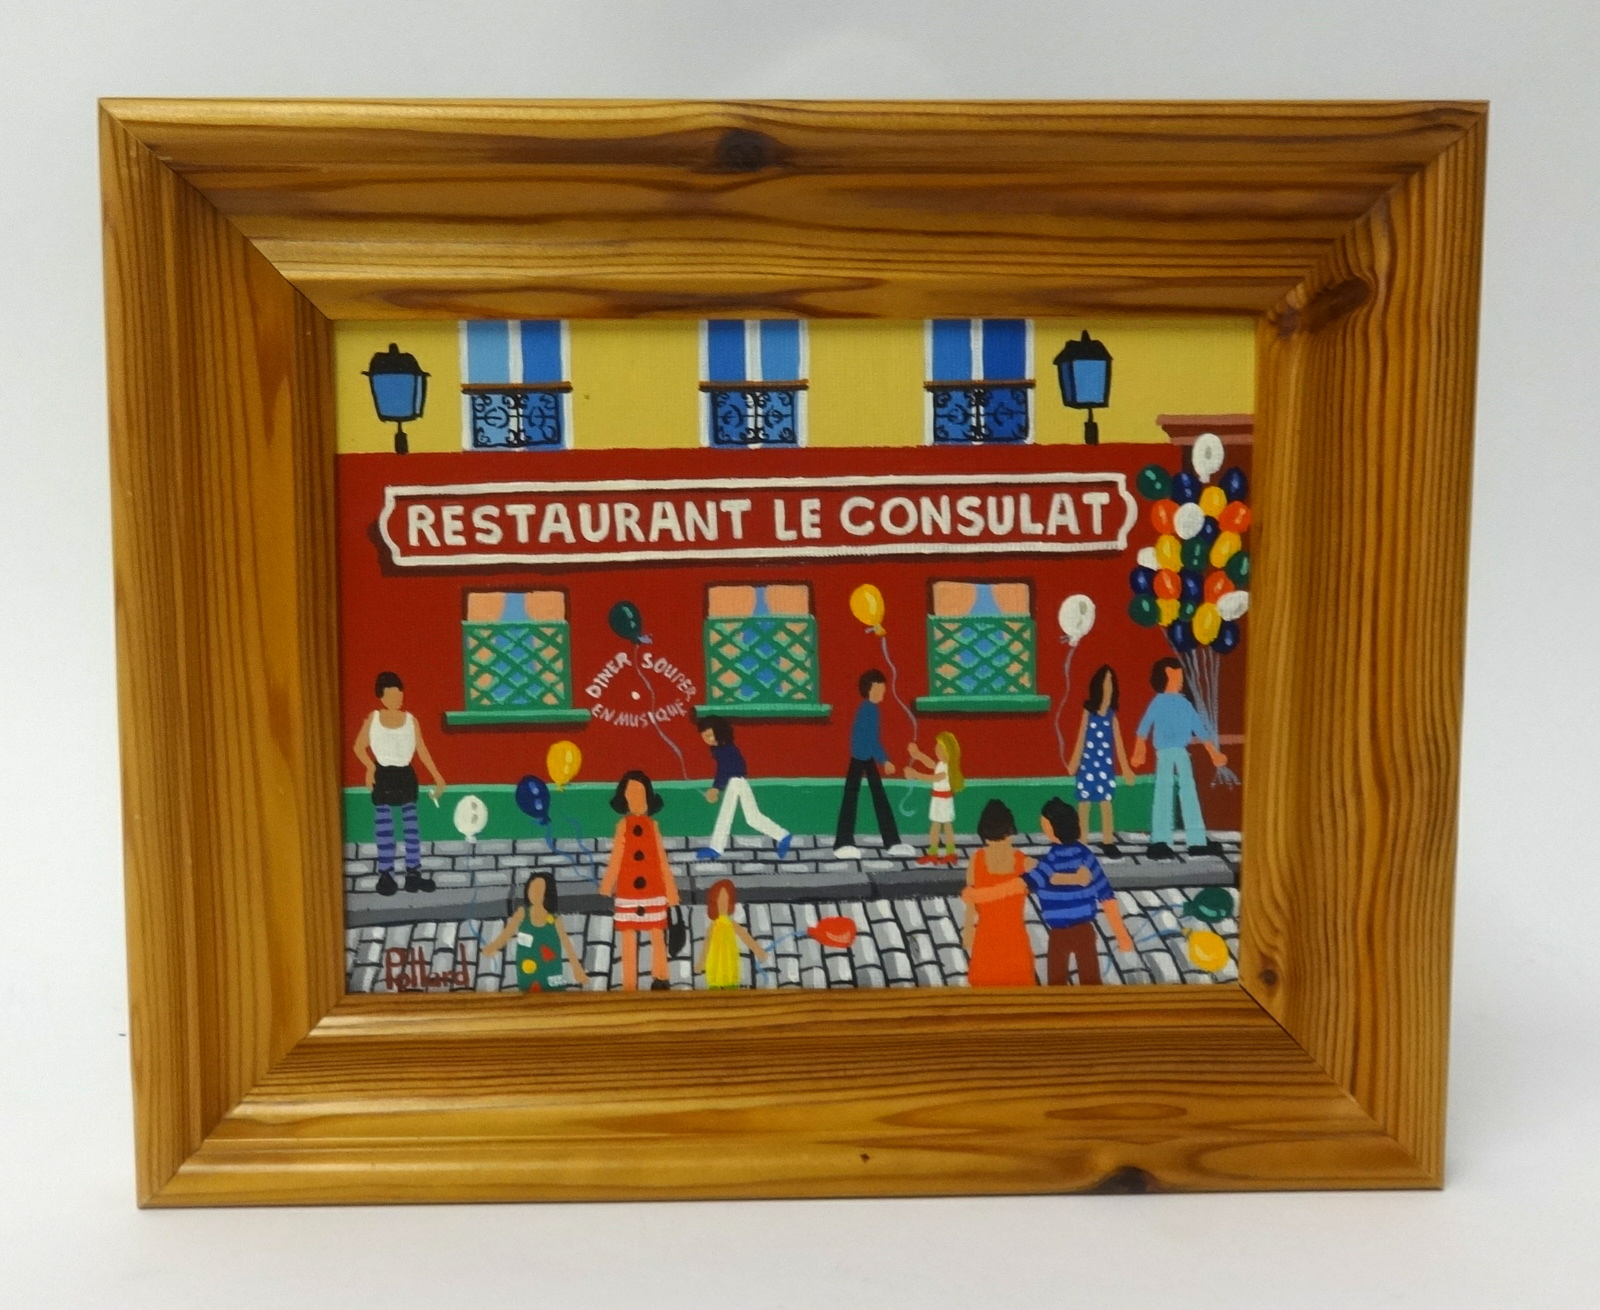 Lot 005 - Brian Pollard, oil on board, 'Restaurant Le Consulat Paris June 91', 15cm x 19cm.